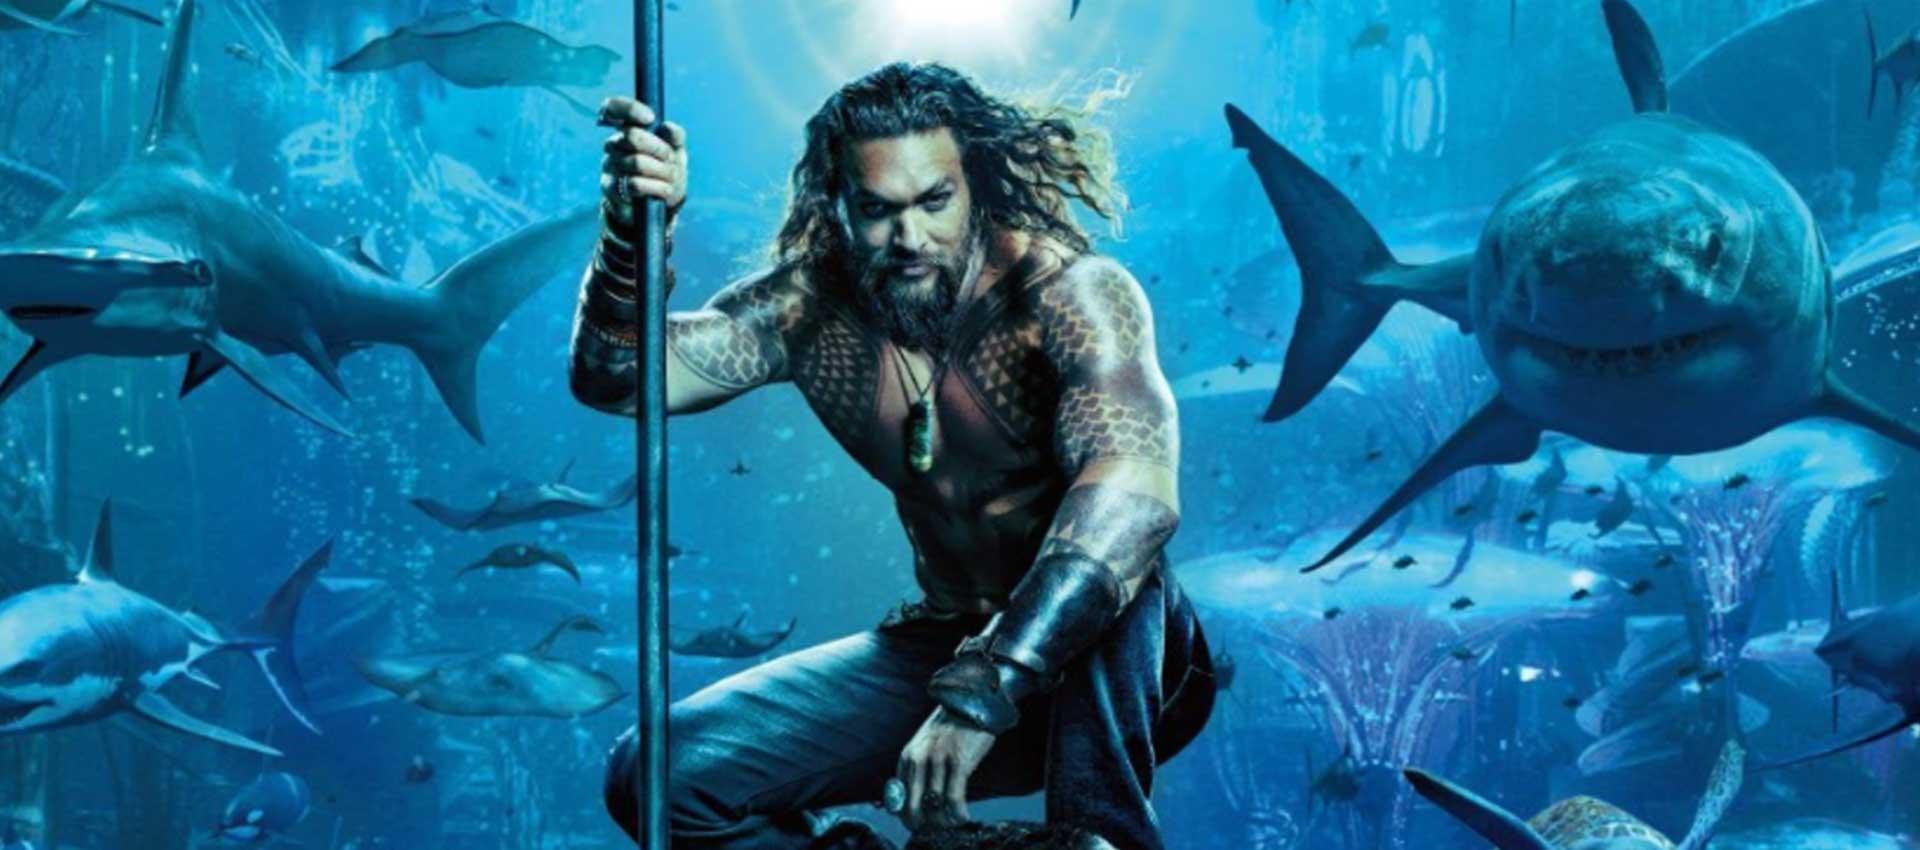 Aquaman İzle türkçe izle hd izle